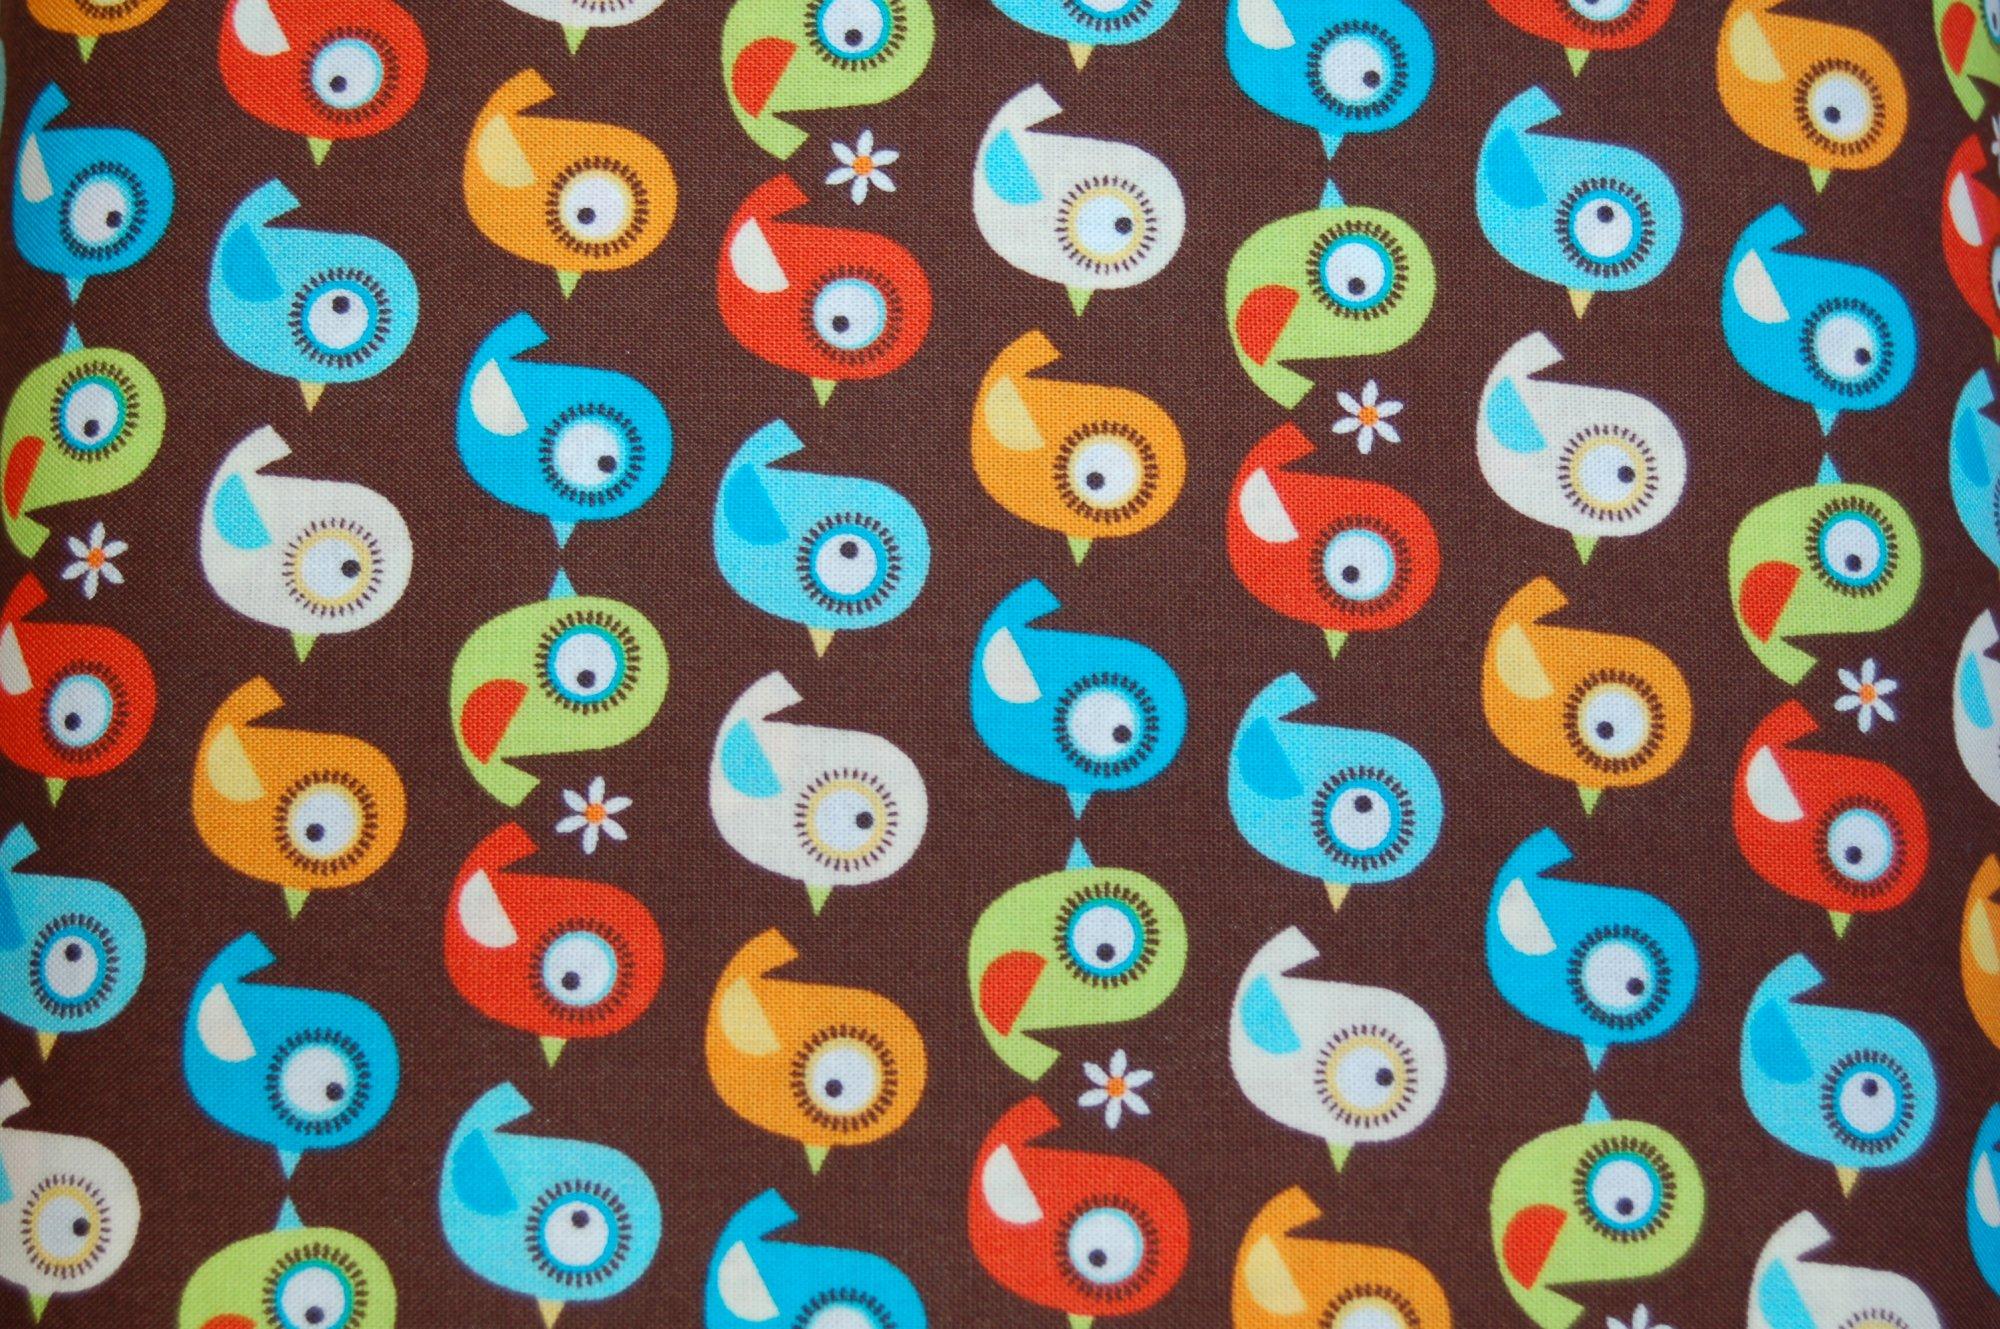 Fiesta Birds by Timeless Treasures